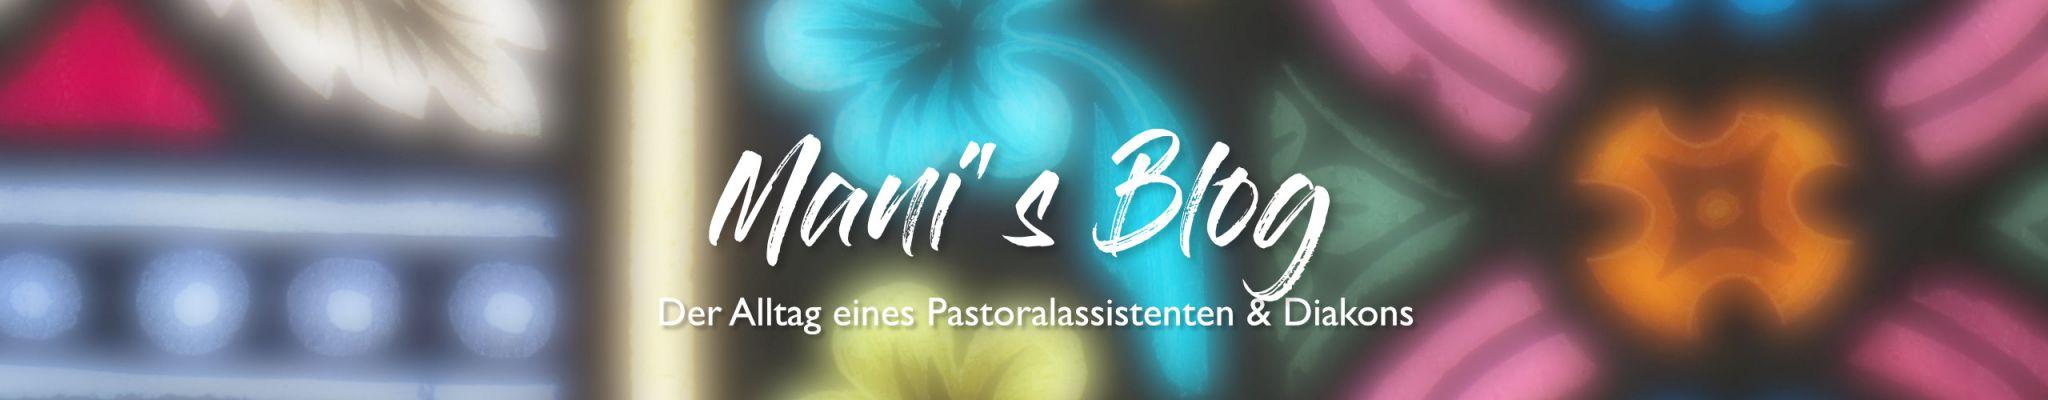 Mani's Blog